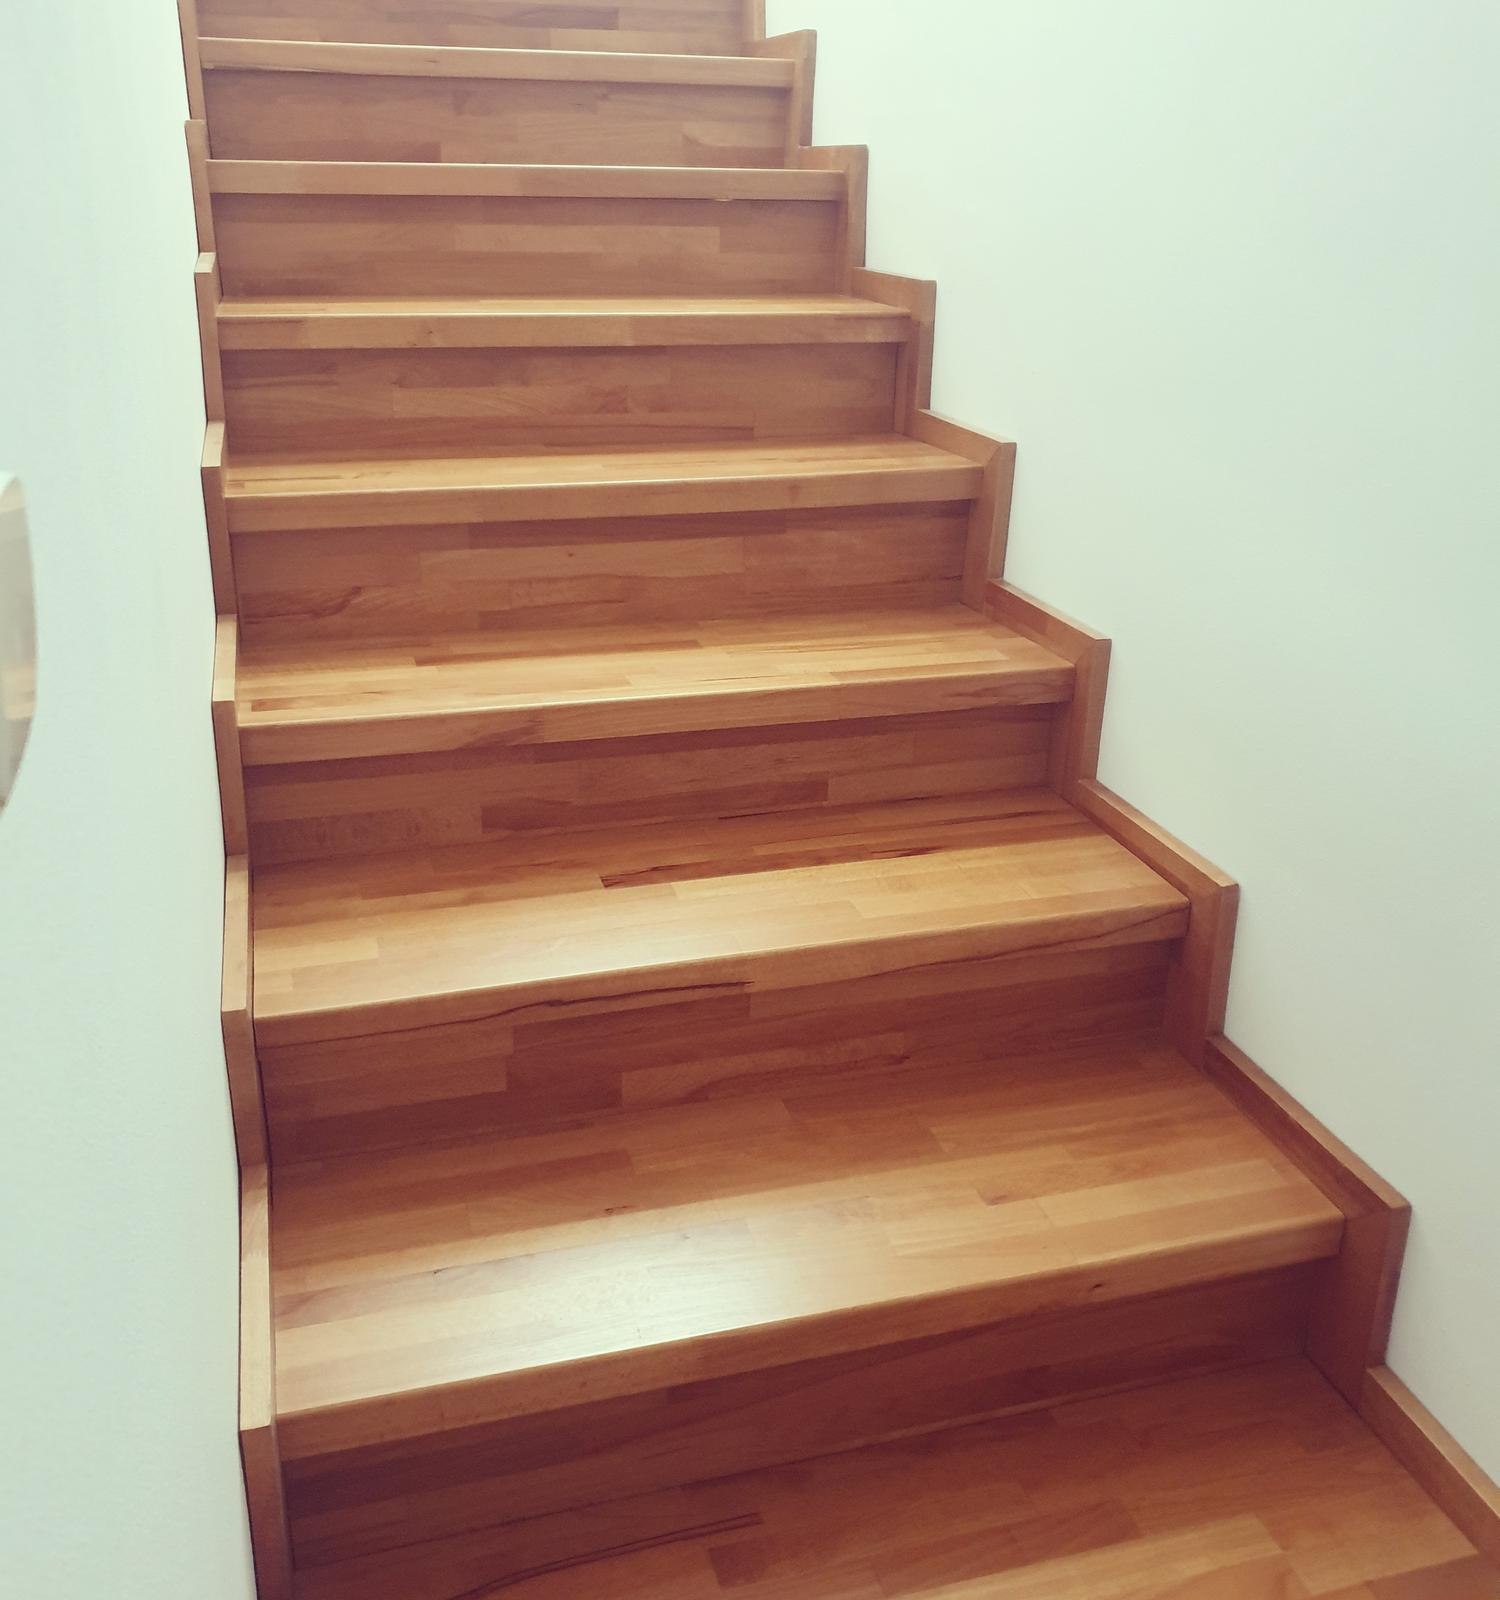 Konzolové schody - BUK, DUB - Obrázok č. 47